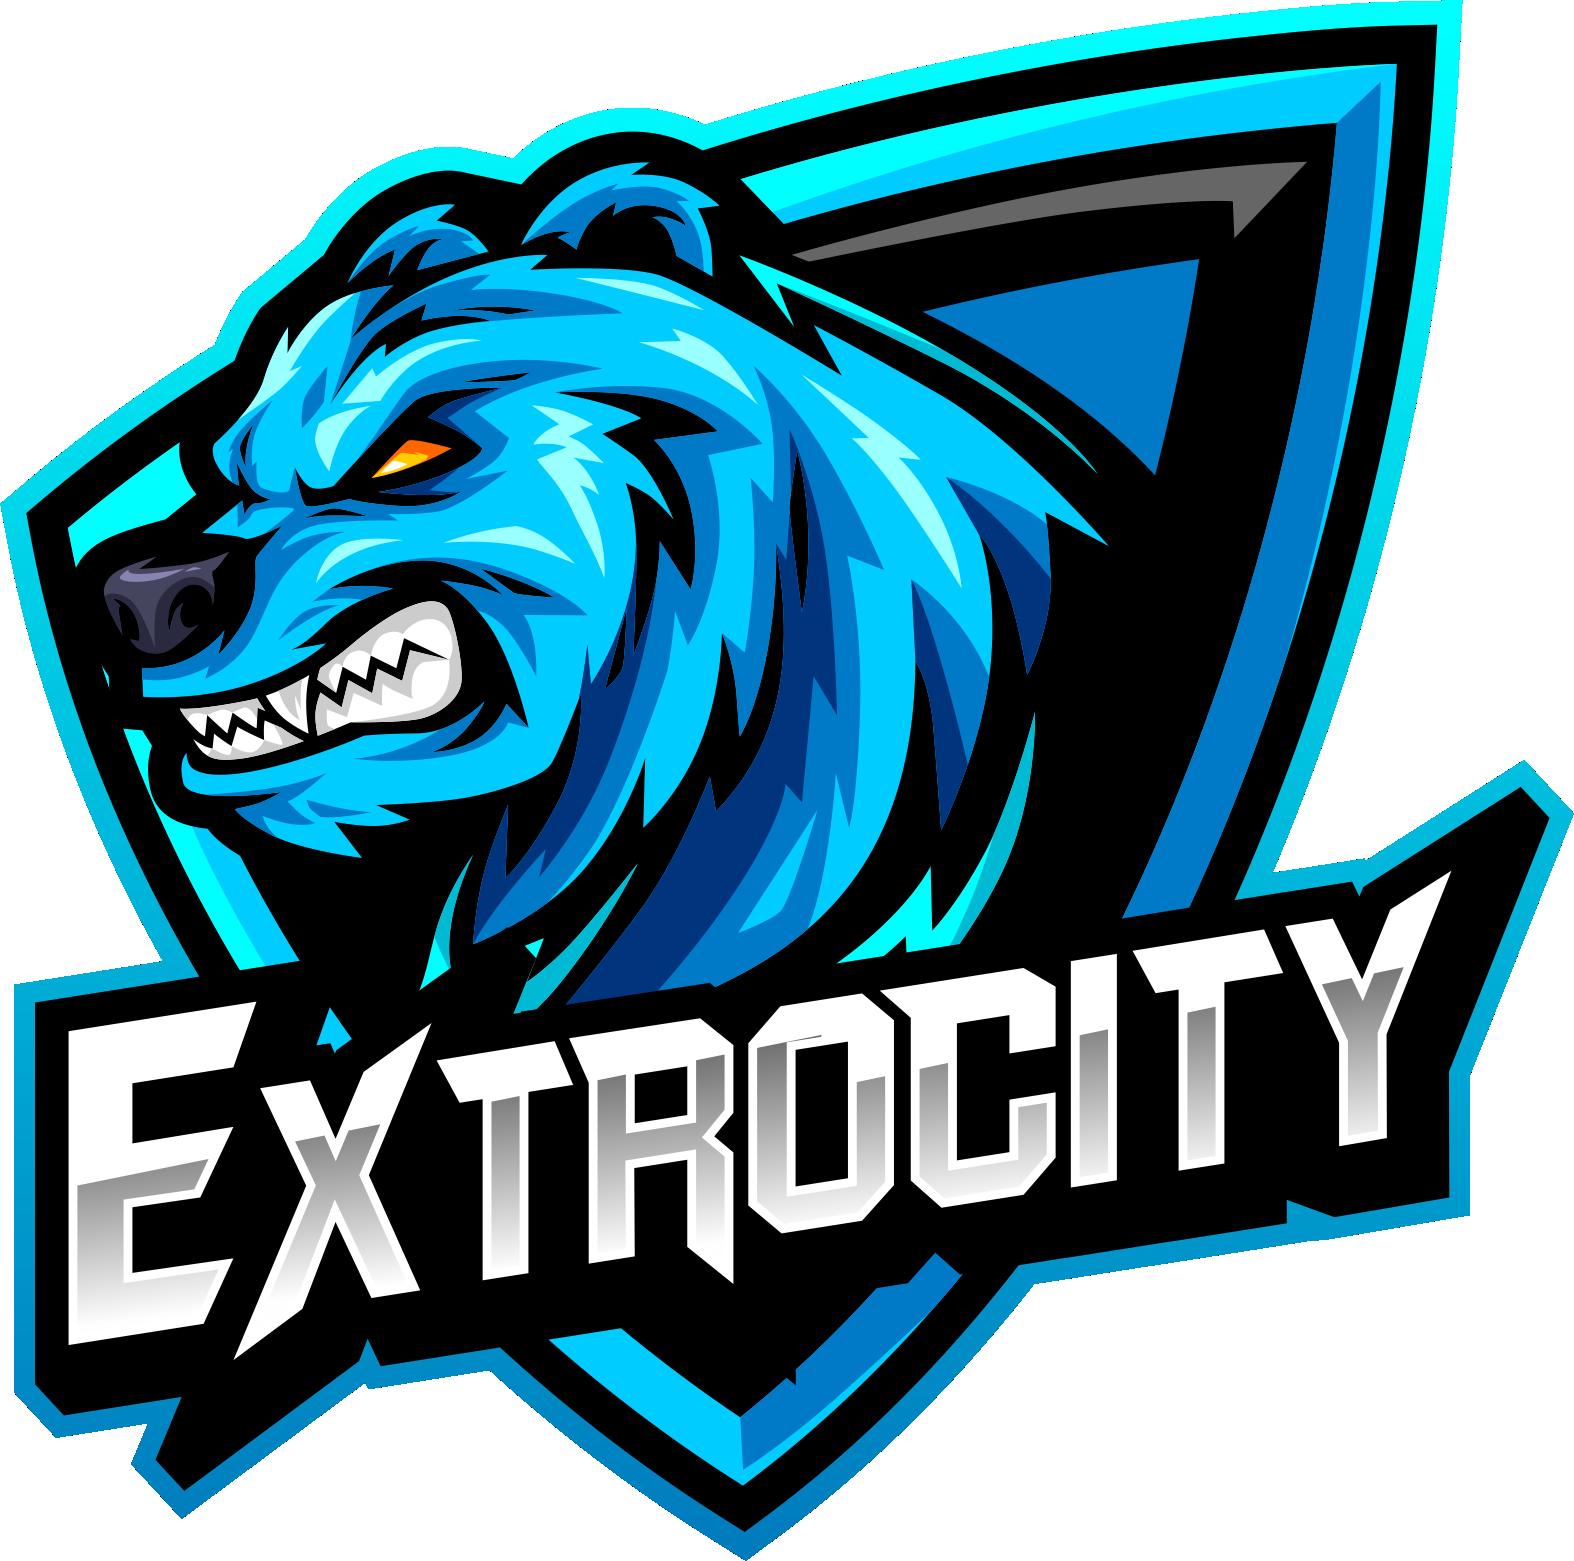 Extrocity